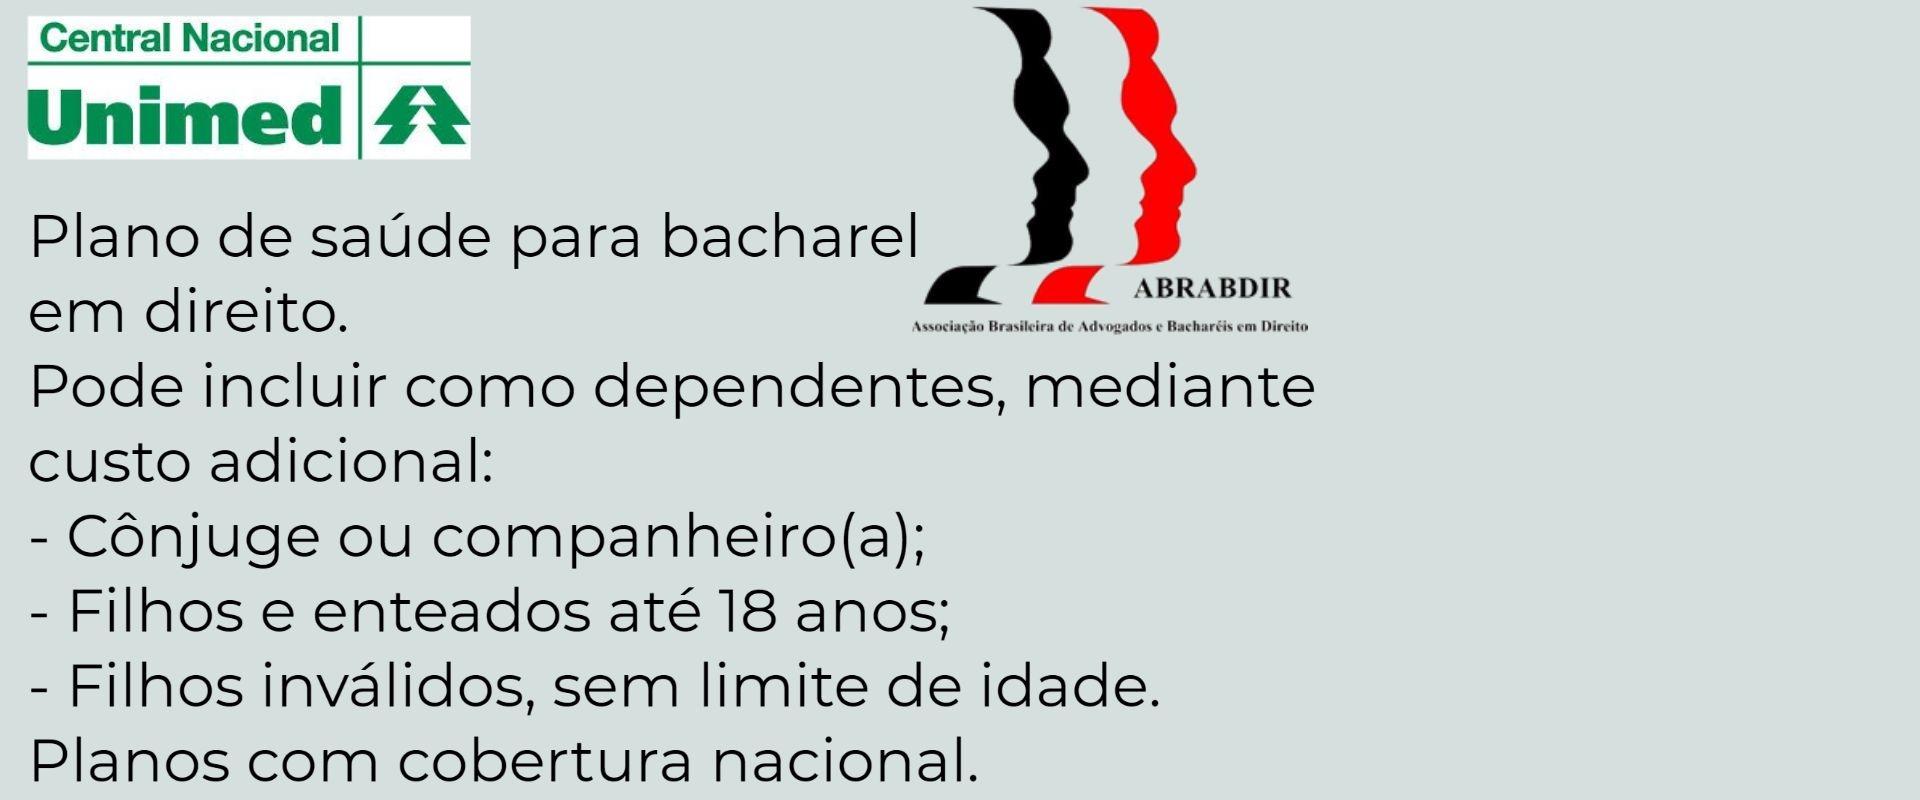 Unimed ABRABDIR Jandira